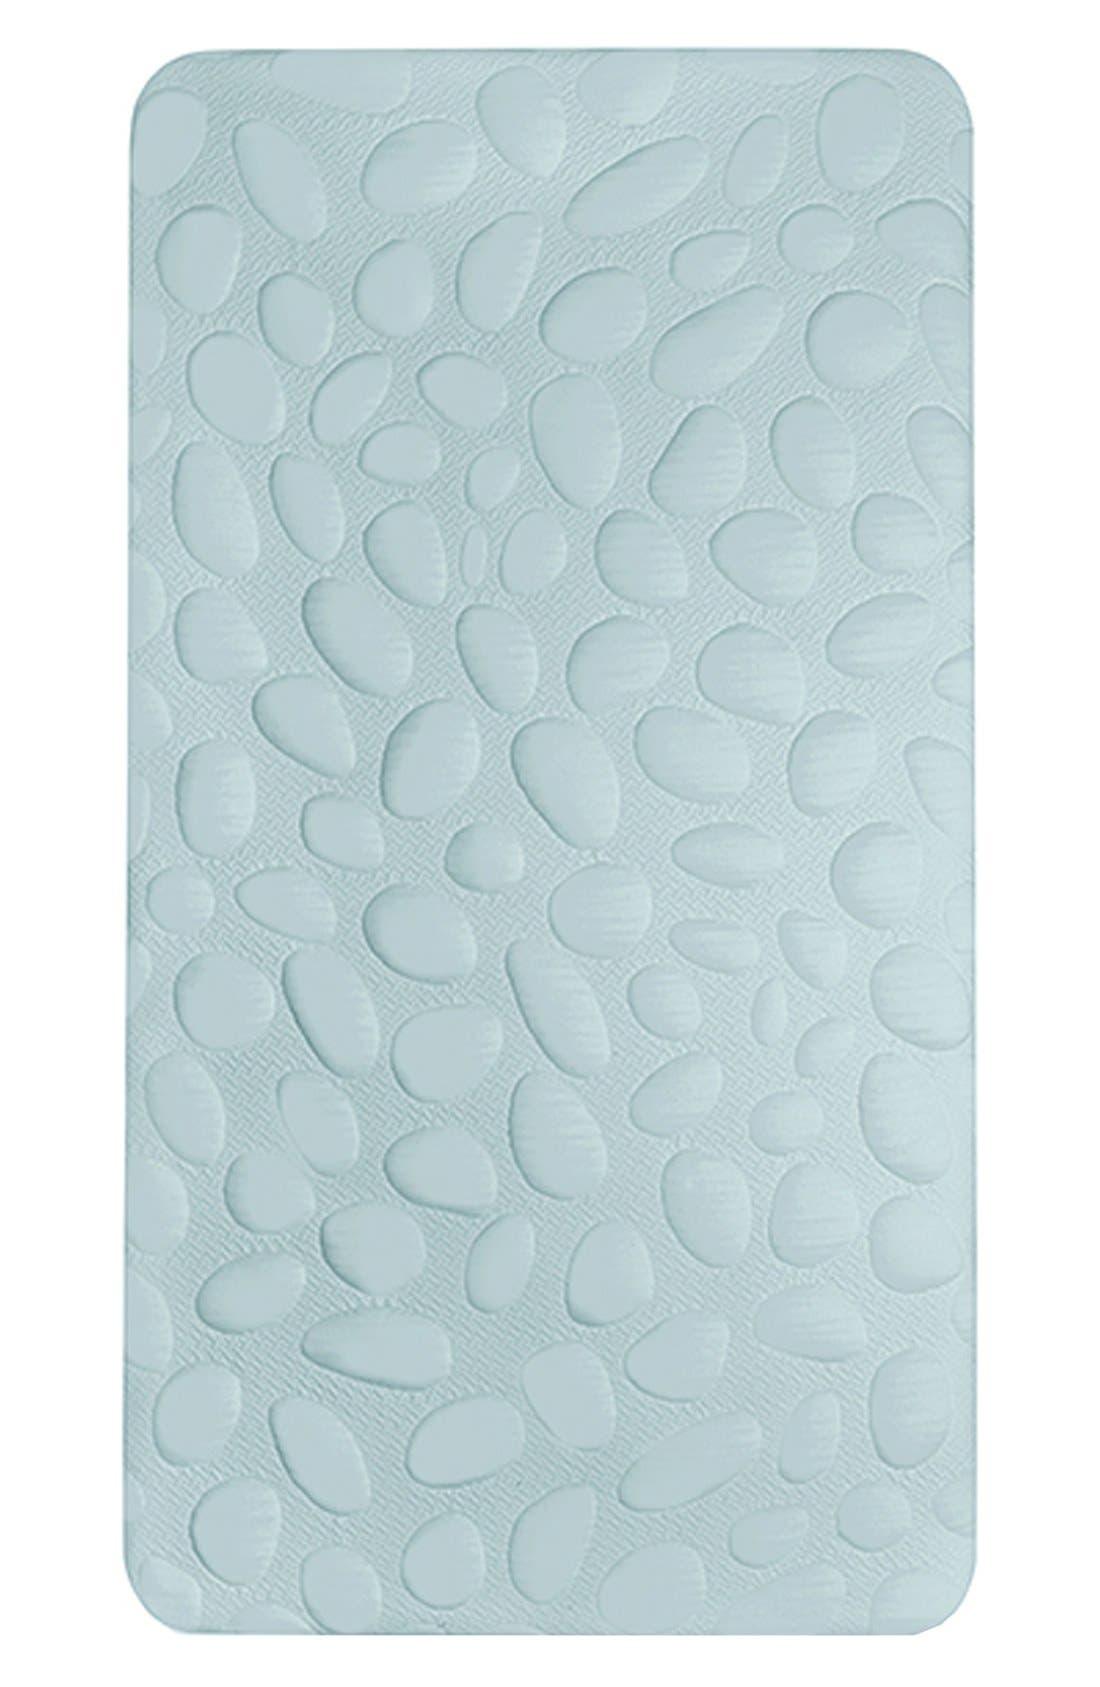 'Pebble Air' Crib Mattress,                         Main,                         color, Sea Glass